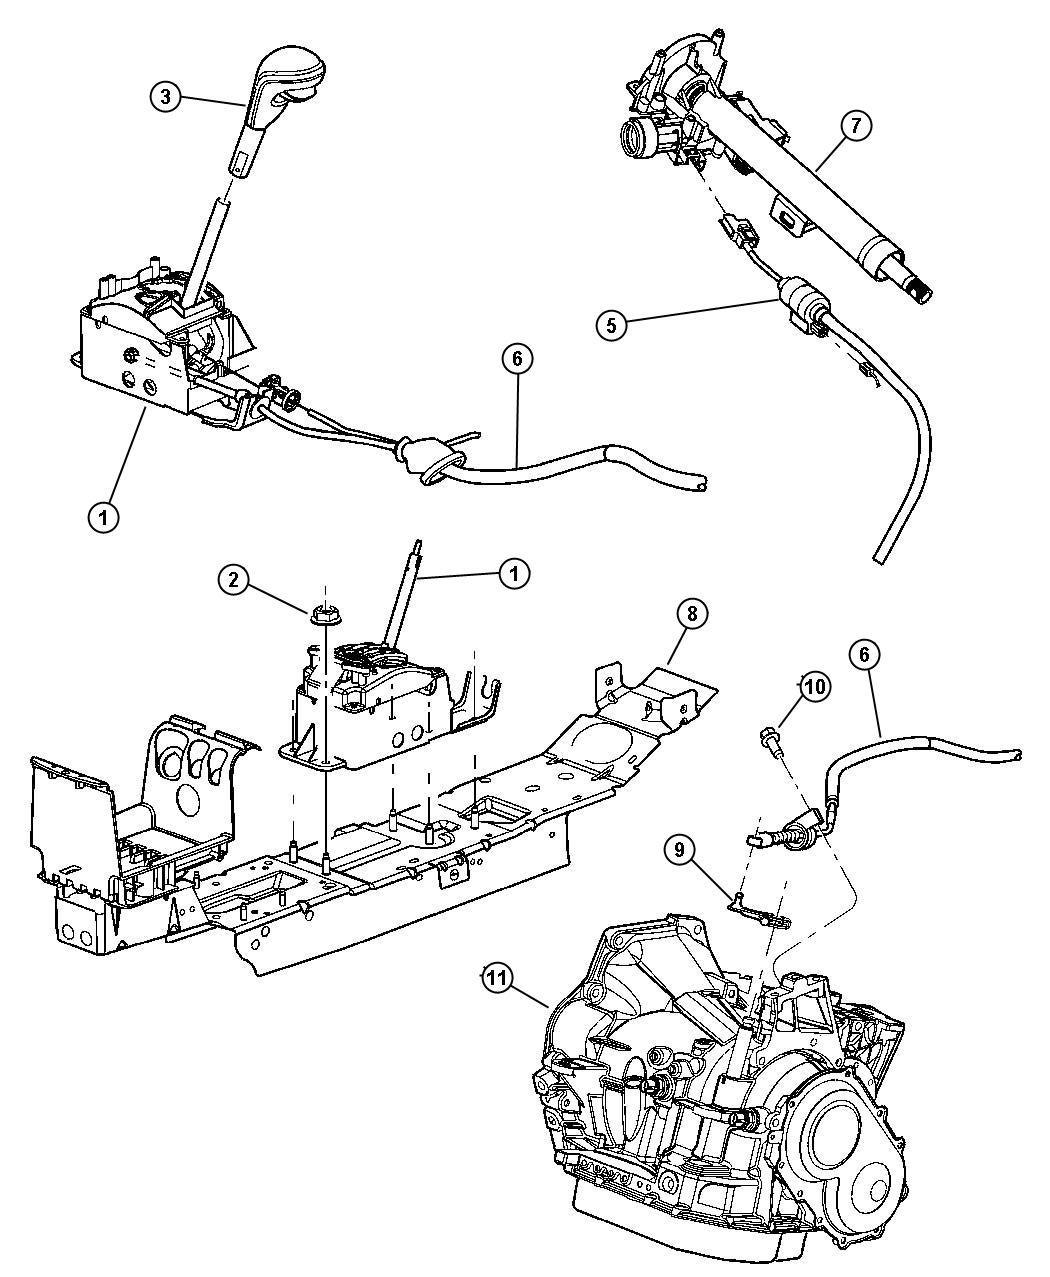 Chrysler Town & Country Nut. Hex. M6x1.00. Body, hood, air